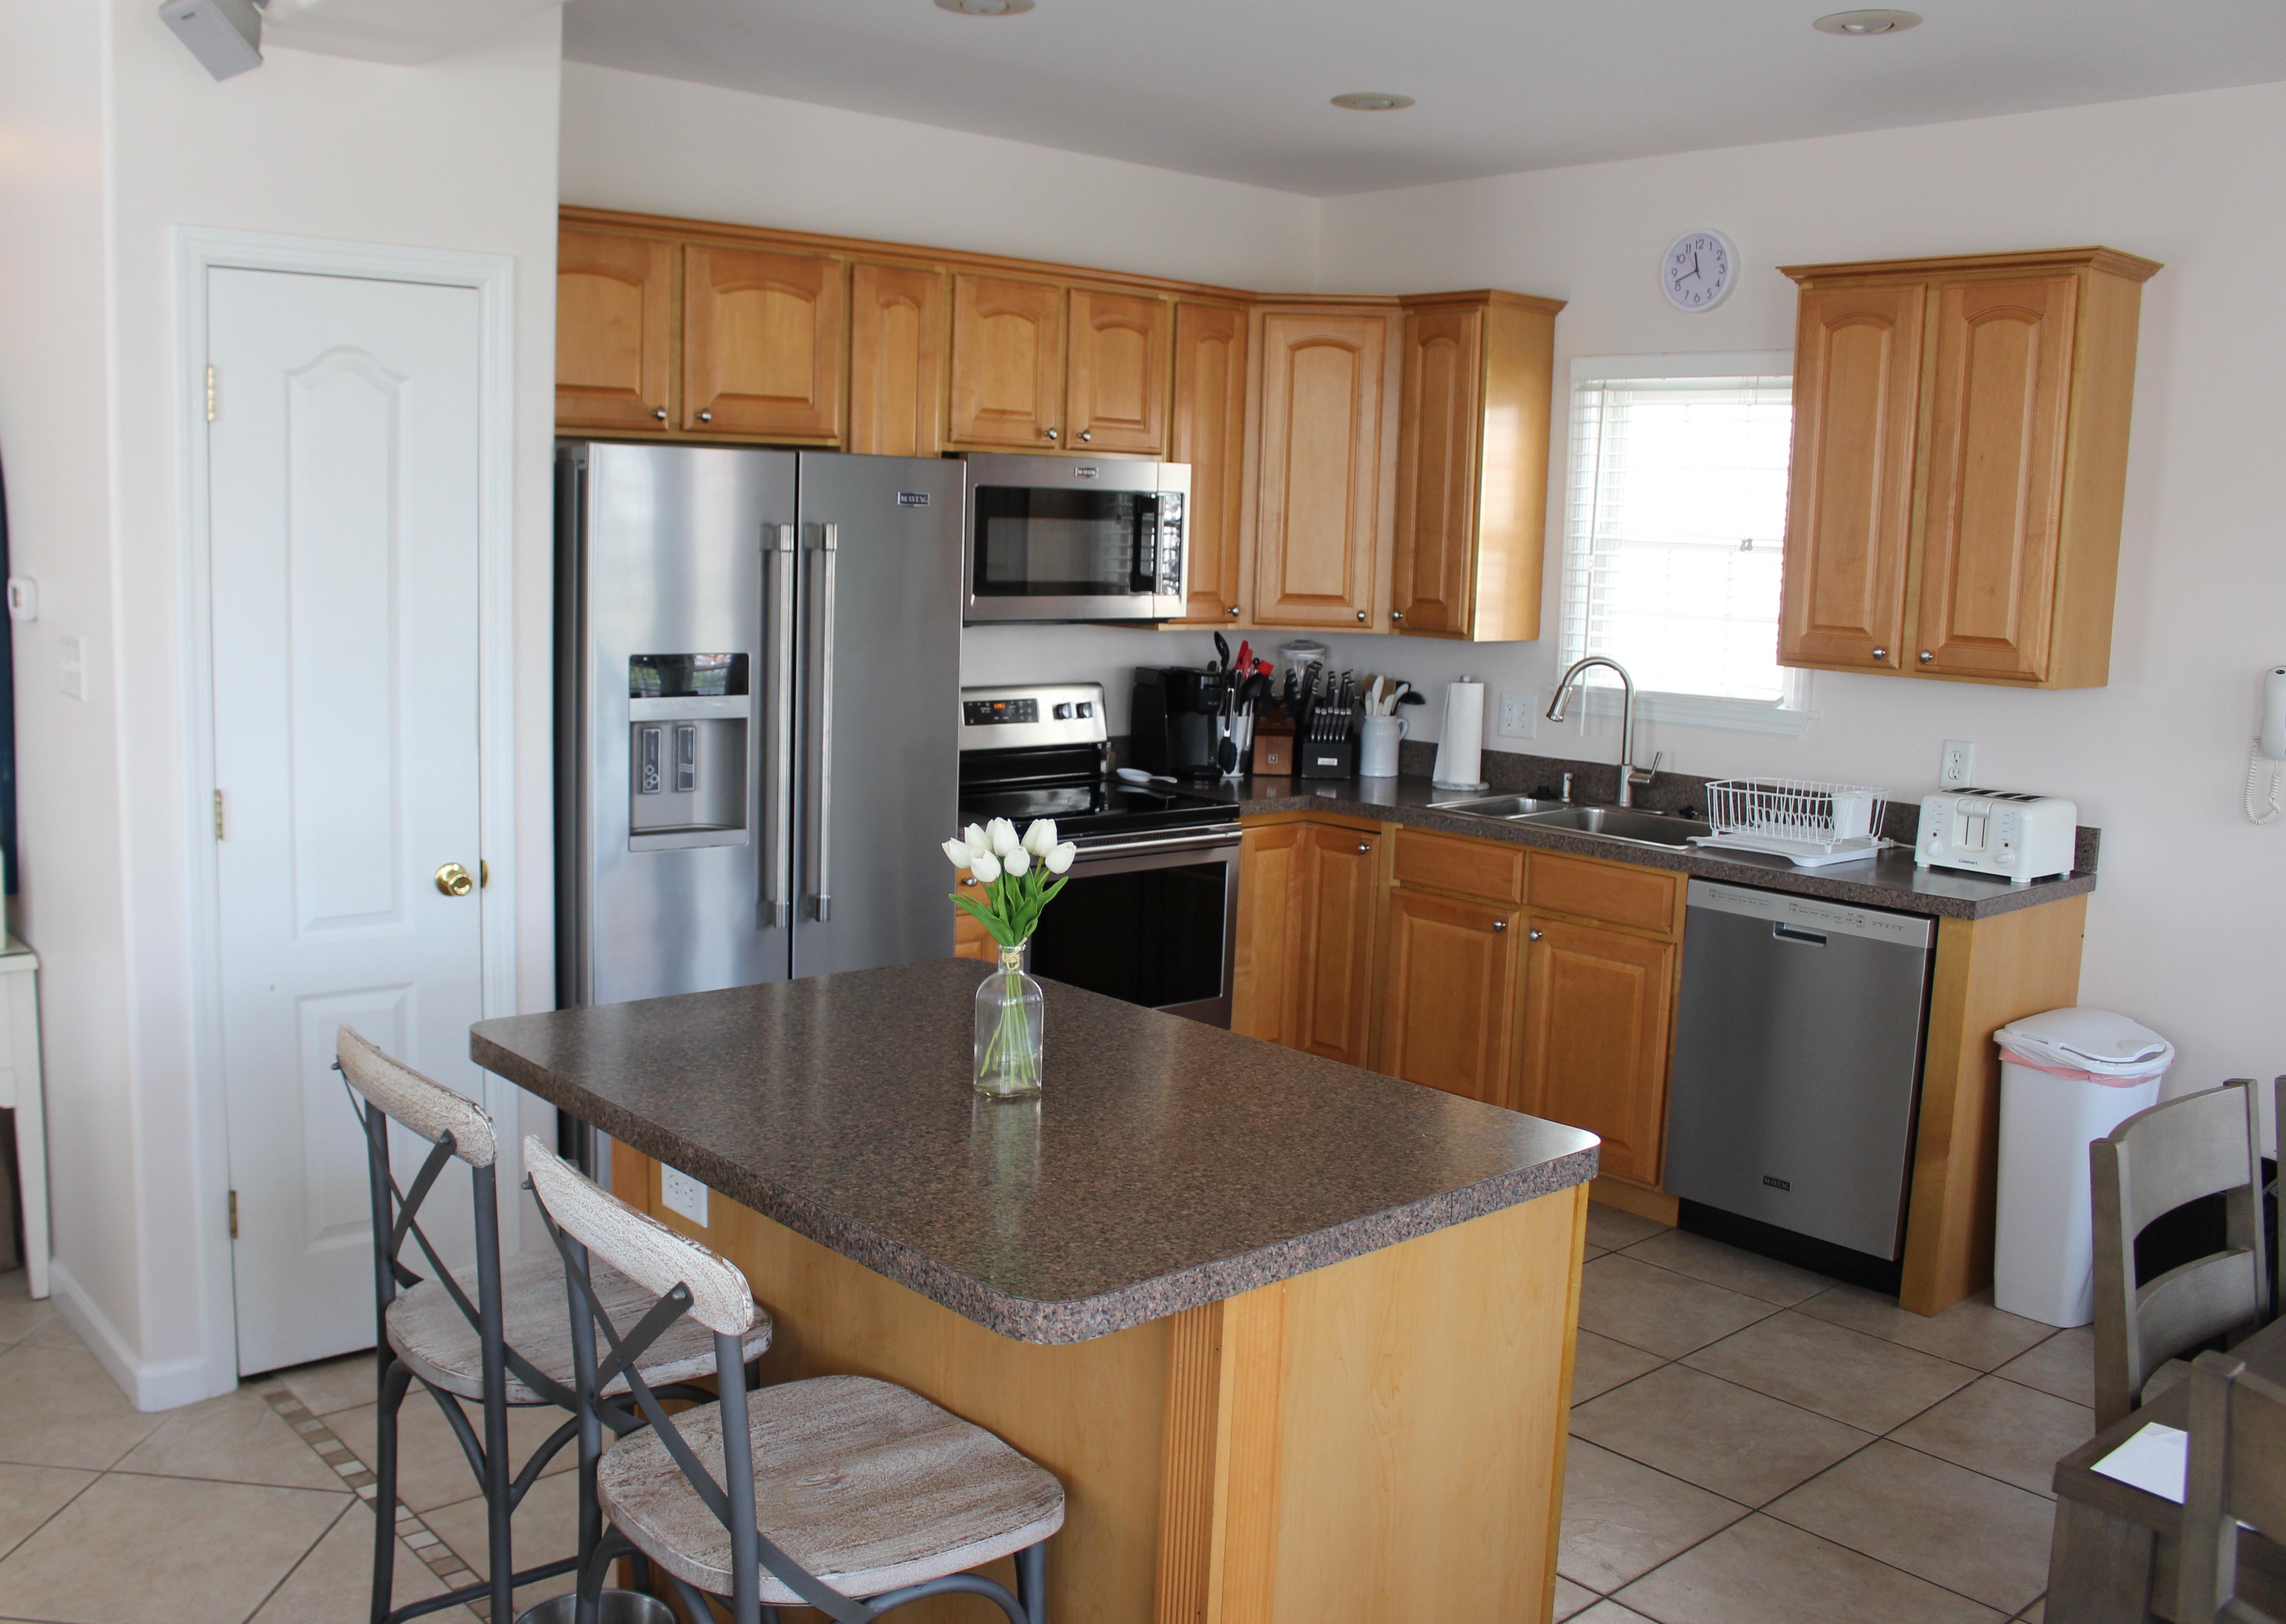 Kitchen with island bar stools